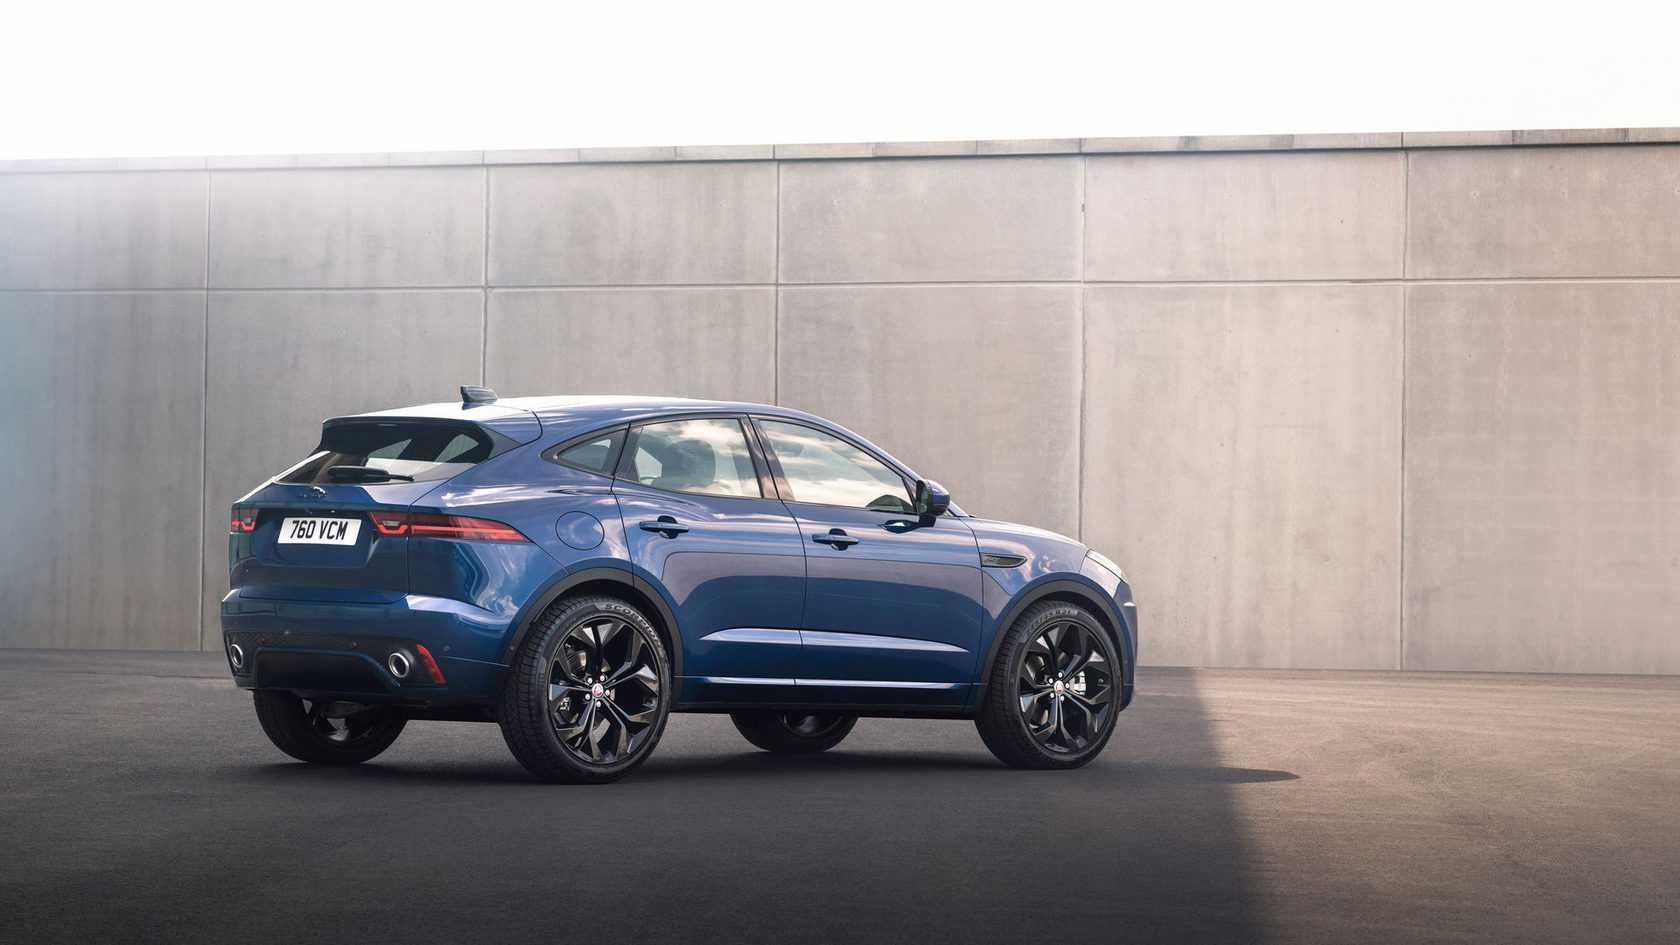 Jaguar e-pace 2018 - фото, характеристики и цены